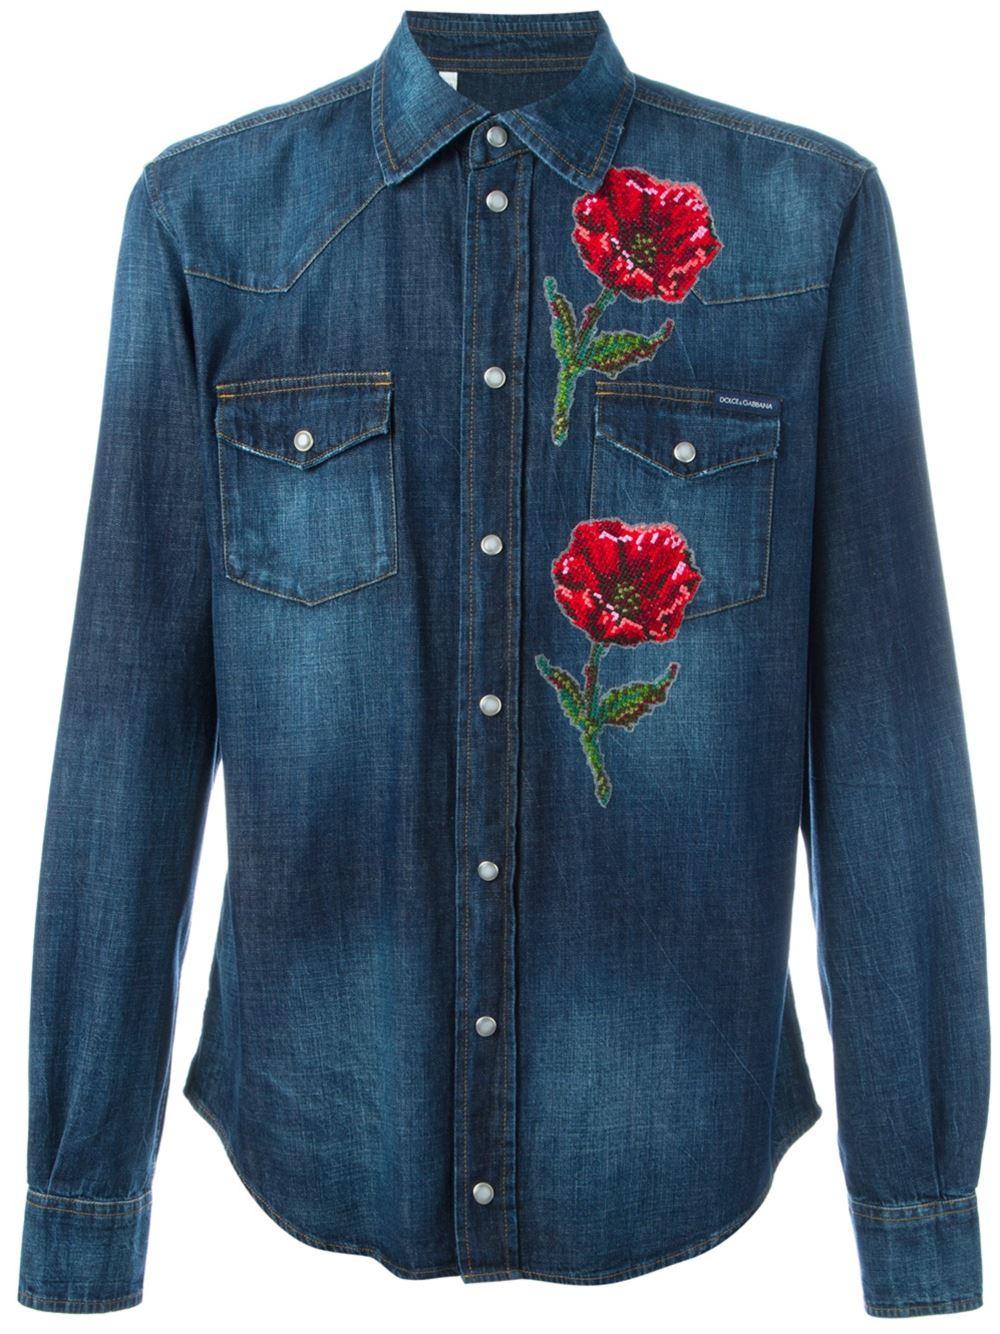 Dolce Amp Gabbana Embroidered Poppy Denim Shirt In Blue For